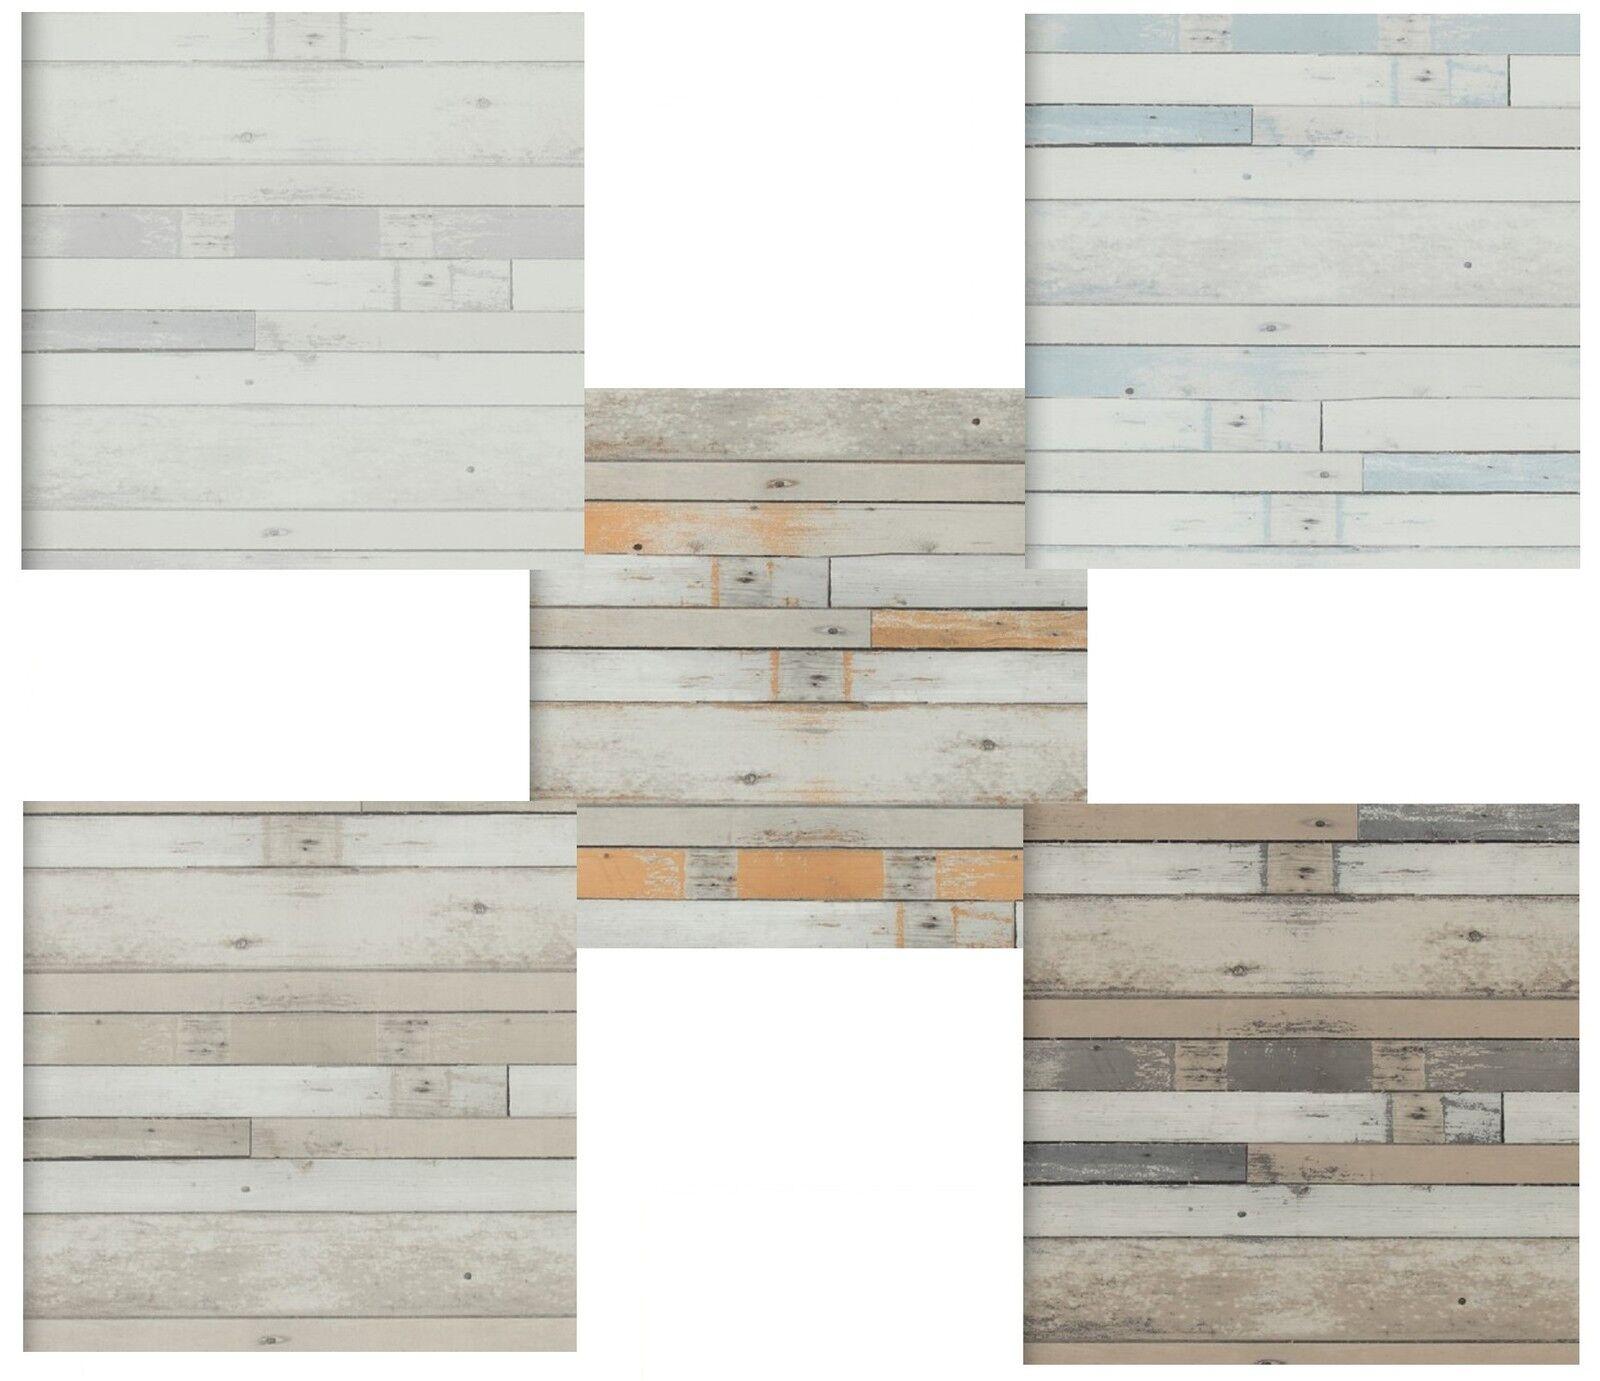 Tapete Blau Muster : fleece wallpaper antique wood pattern paneled boards brown ~ Watch28wear.com Haus und Dekorationen